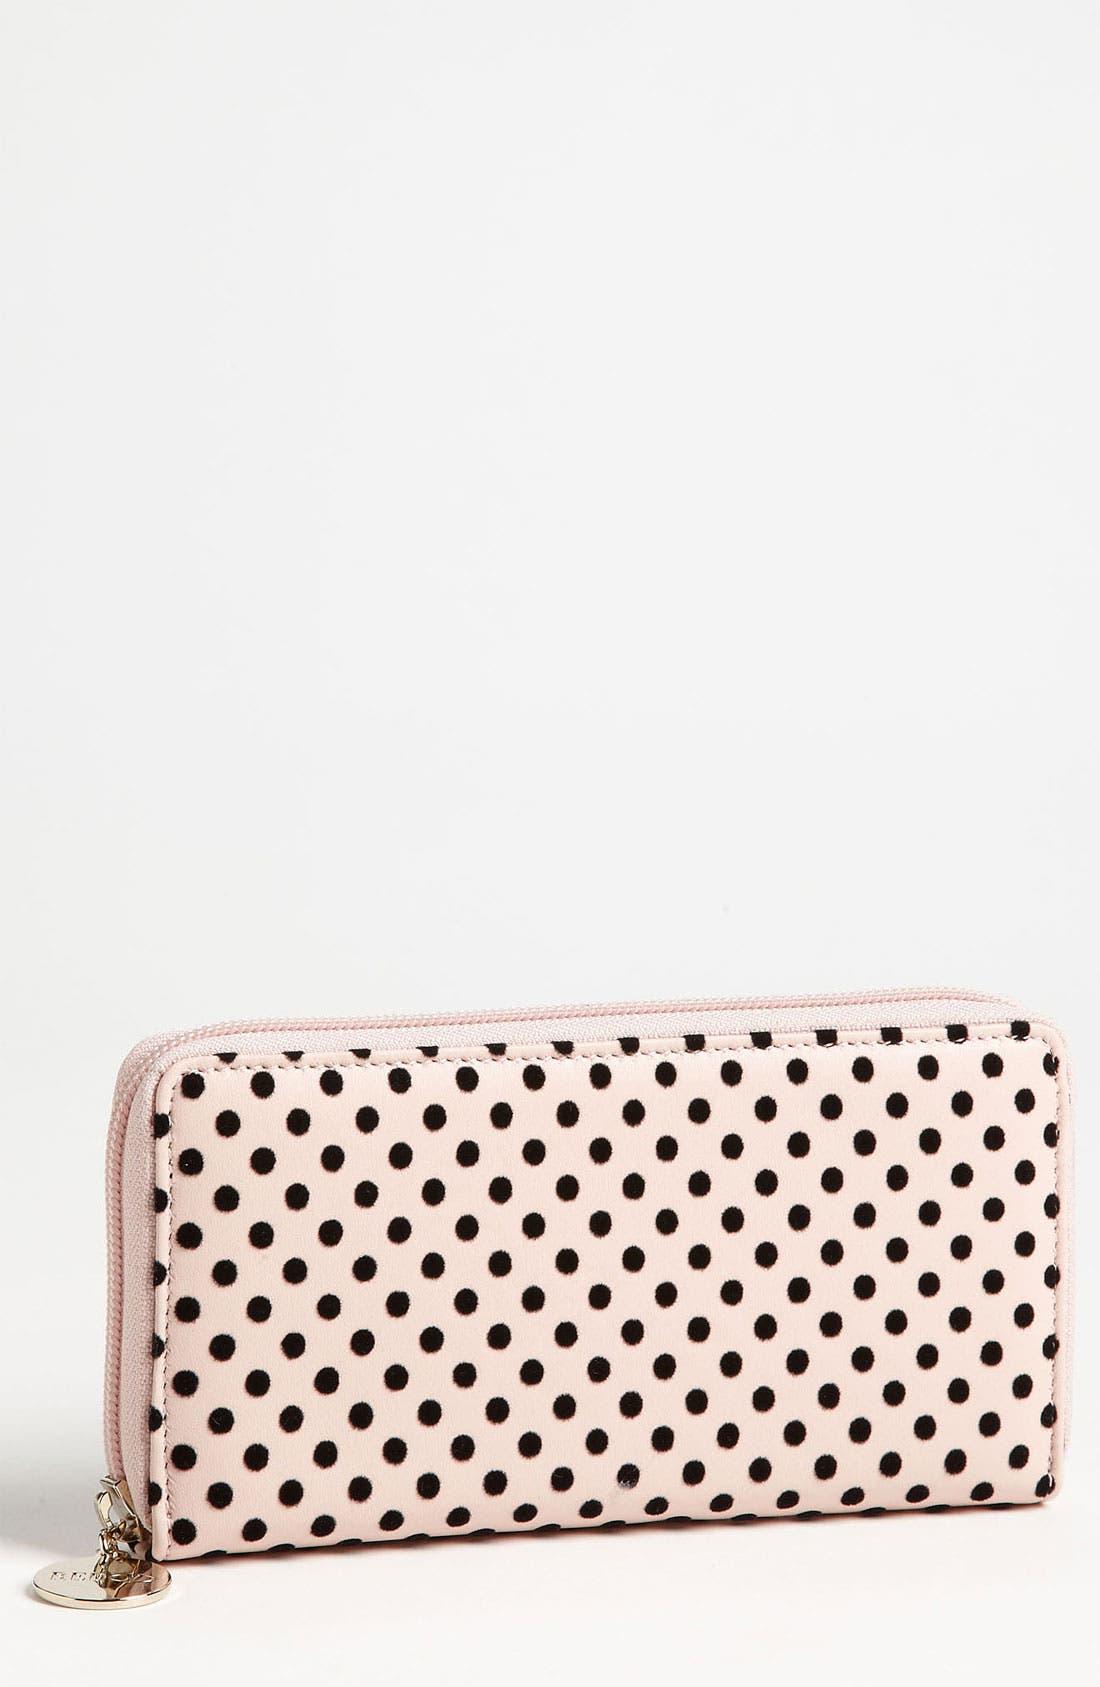 Main Image - RED Valentino 'Dots' Continental Wallet